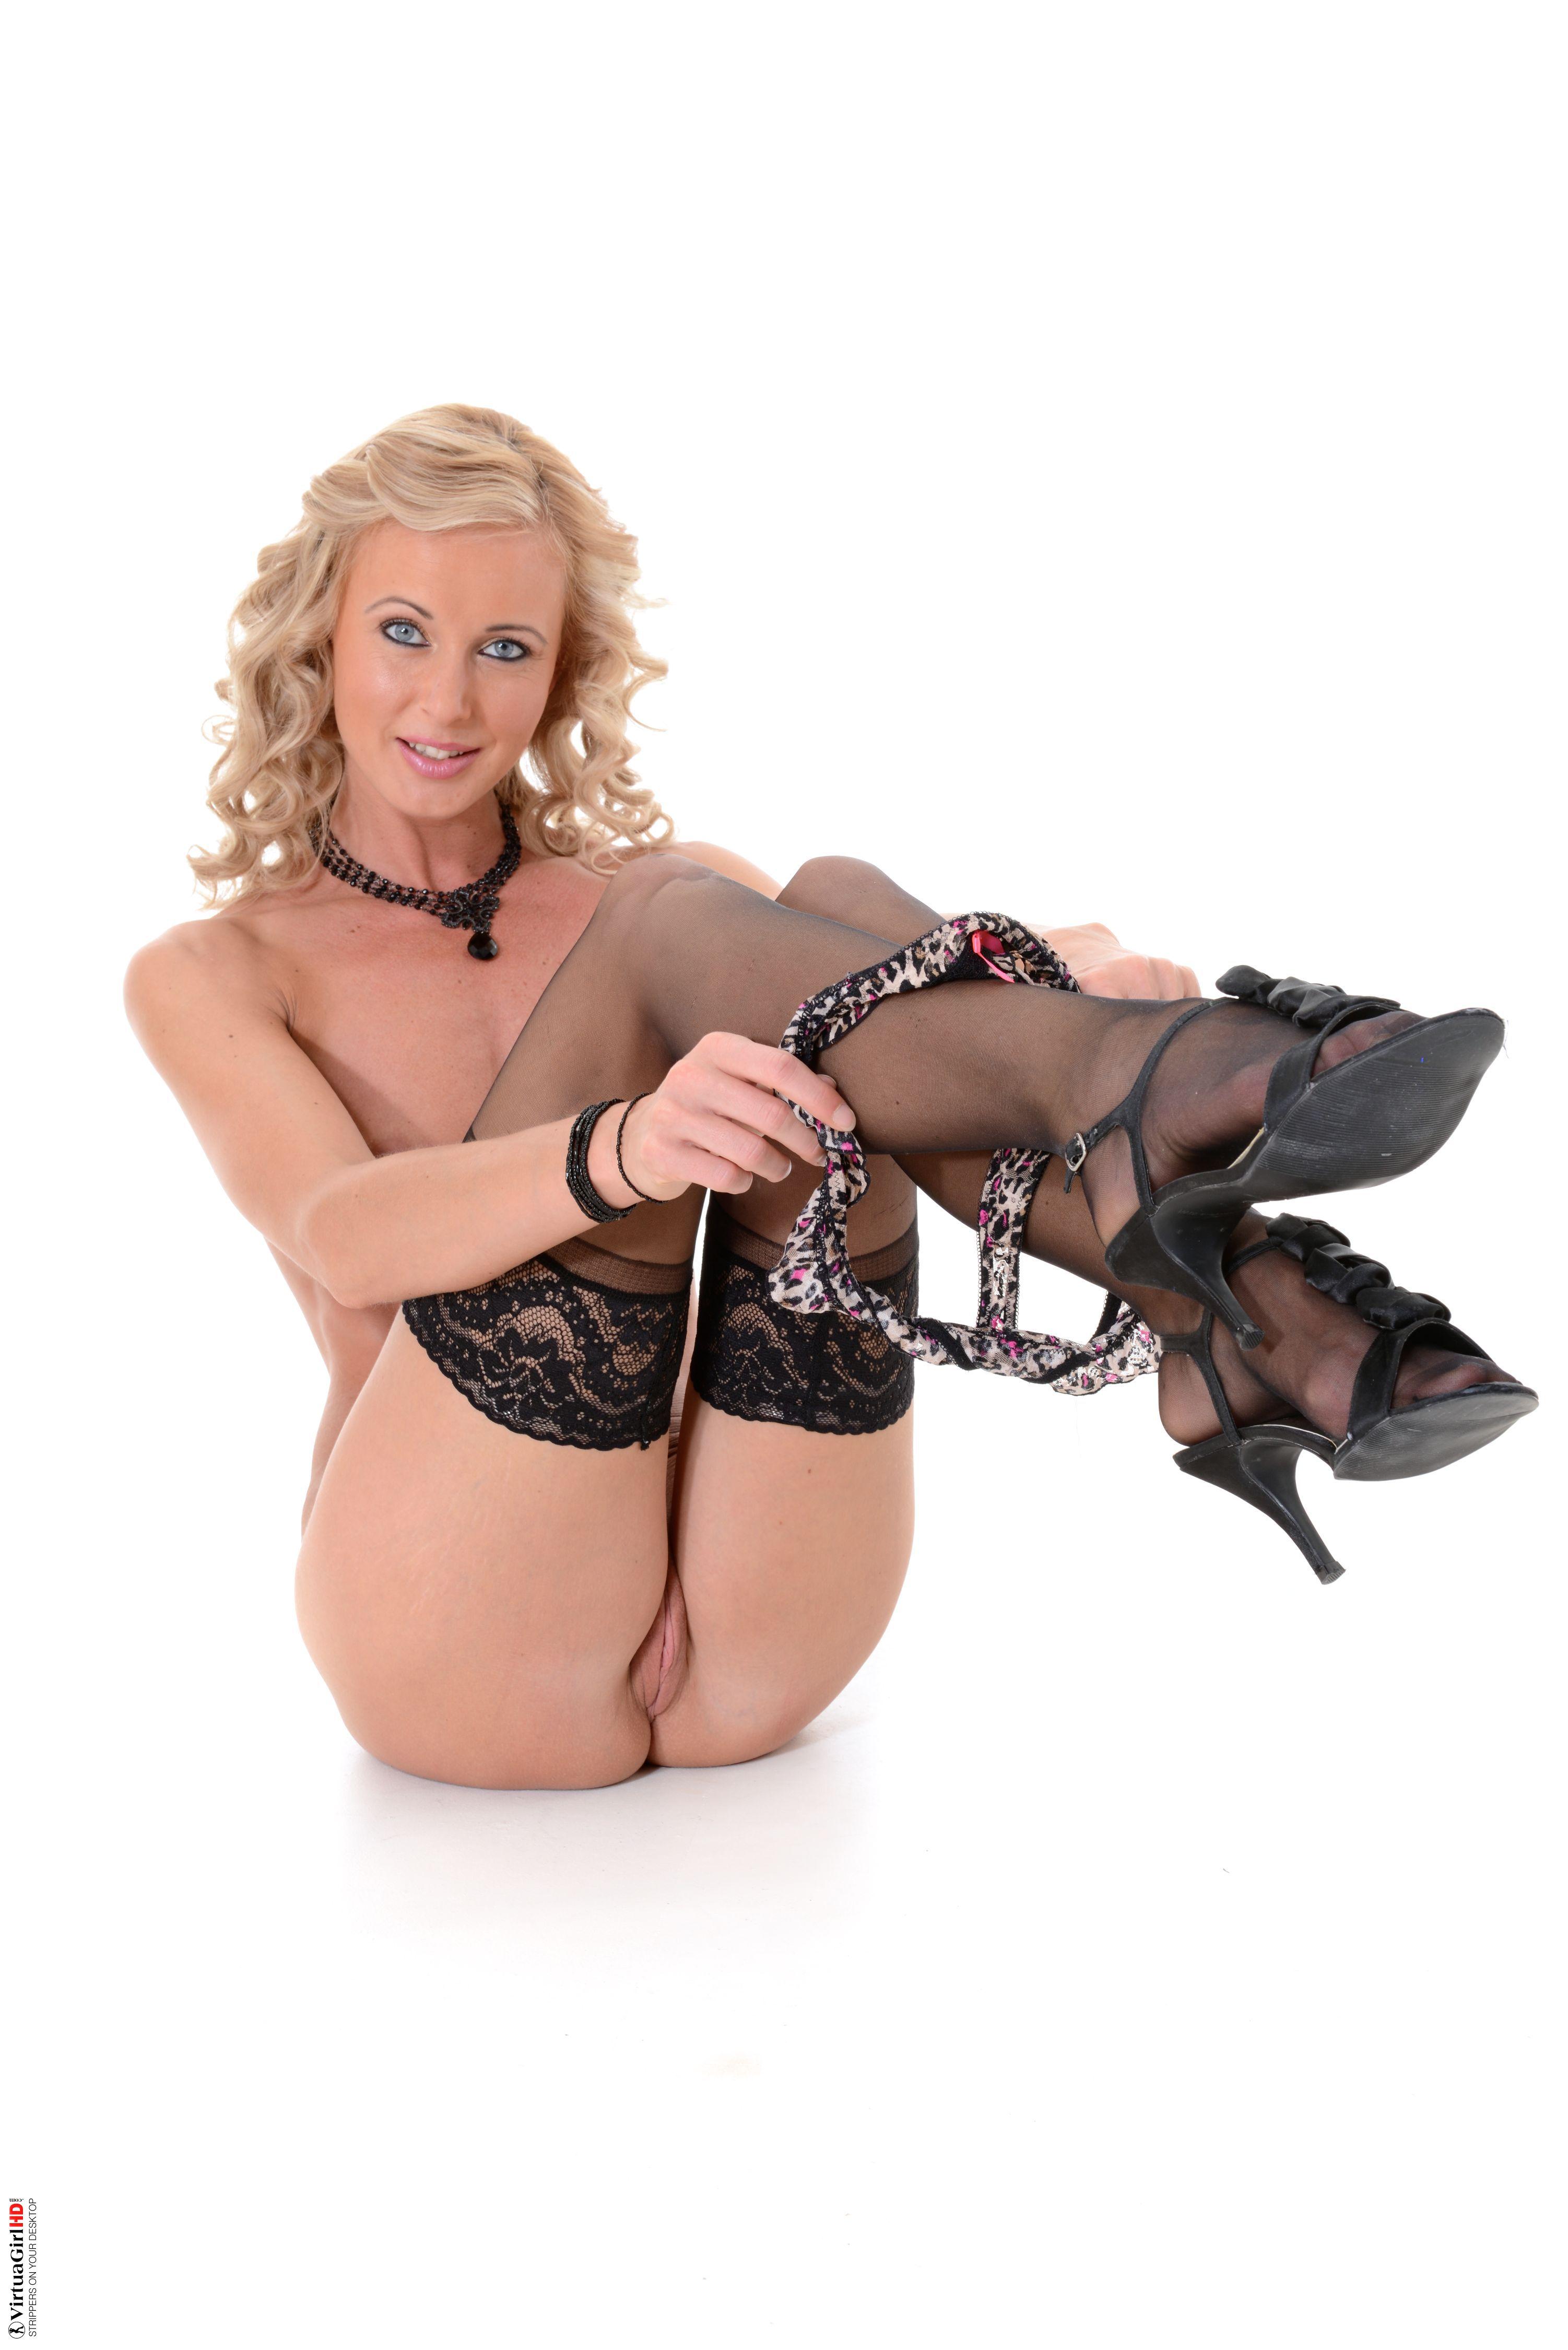 sexy girls stripping pornhub big ass